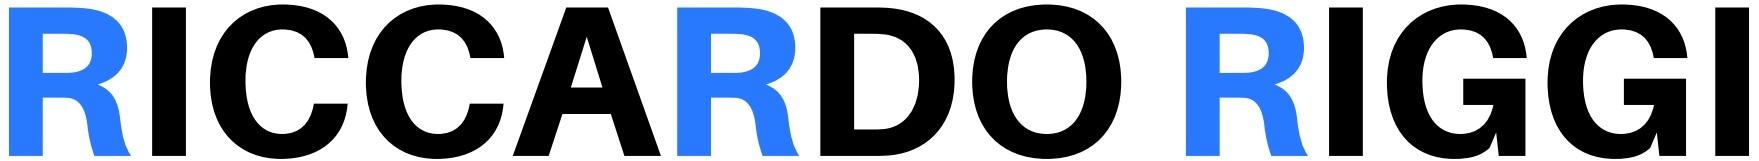 Logo di Riccardo Riggi